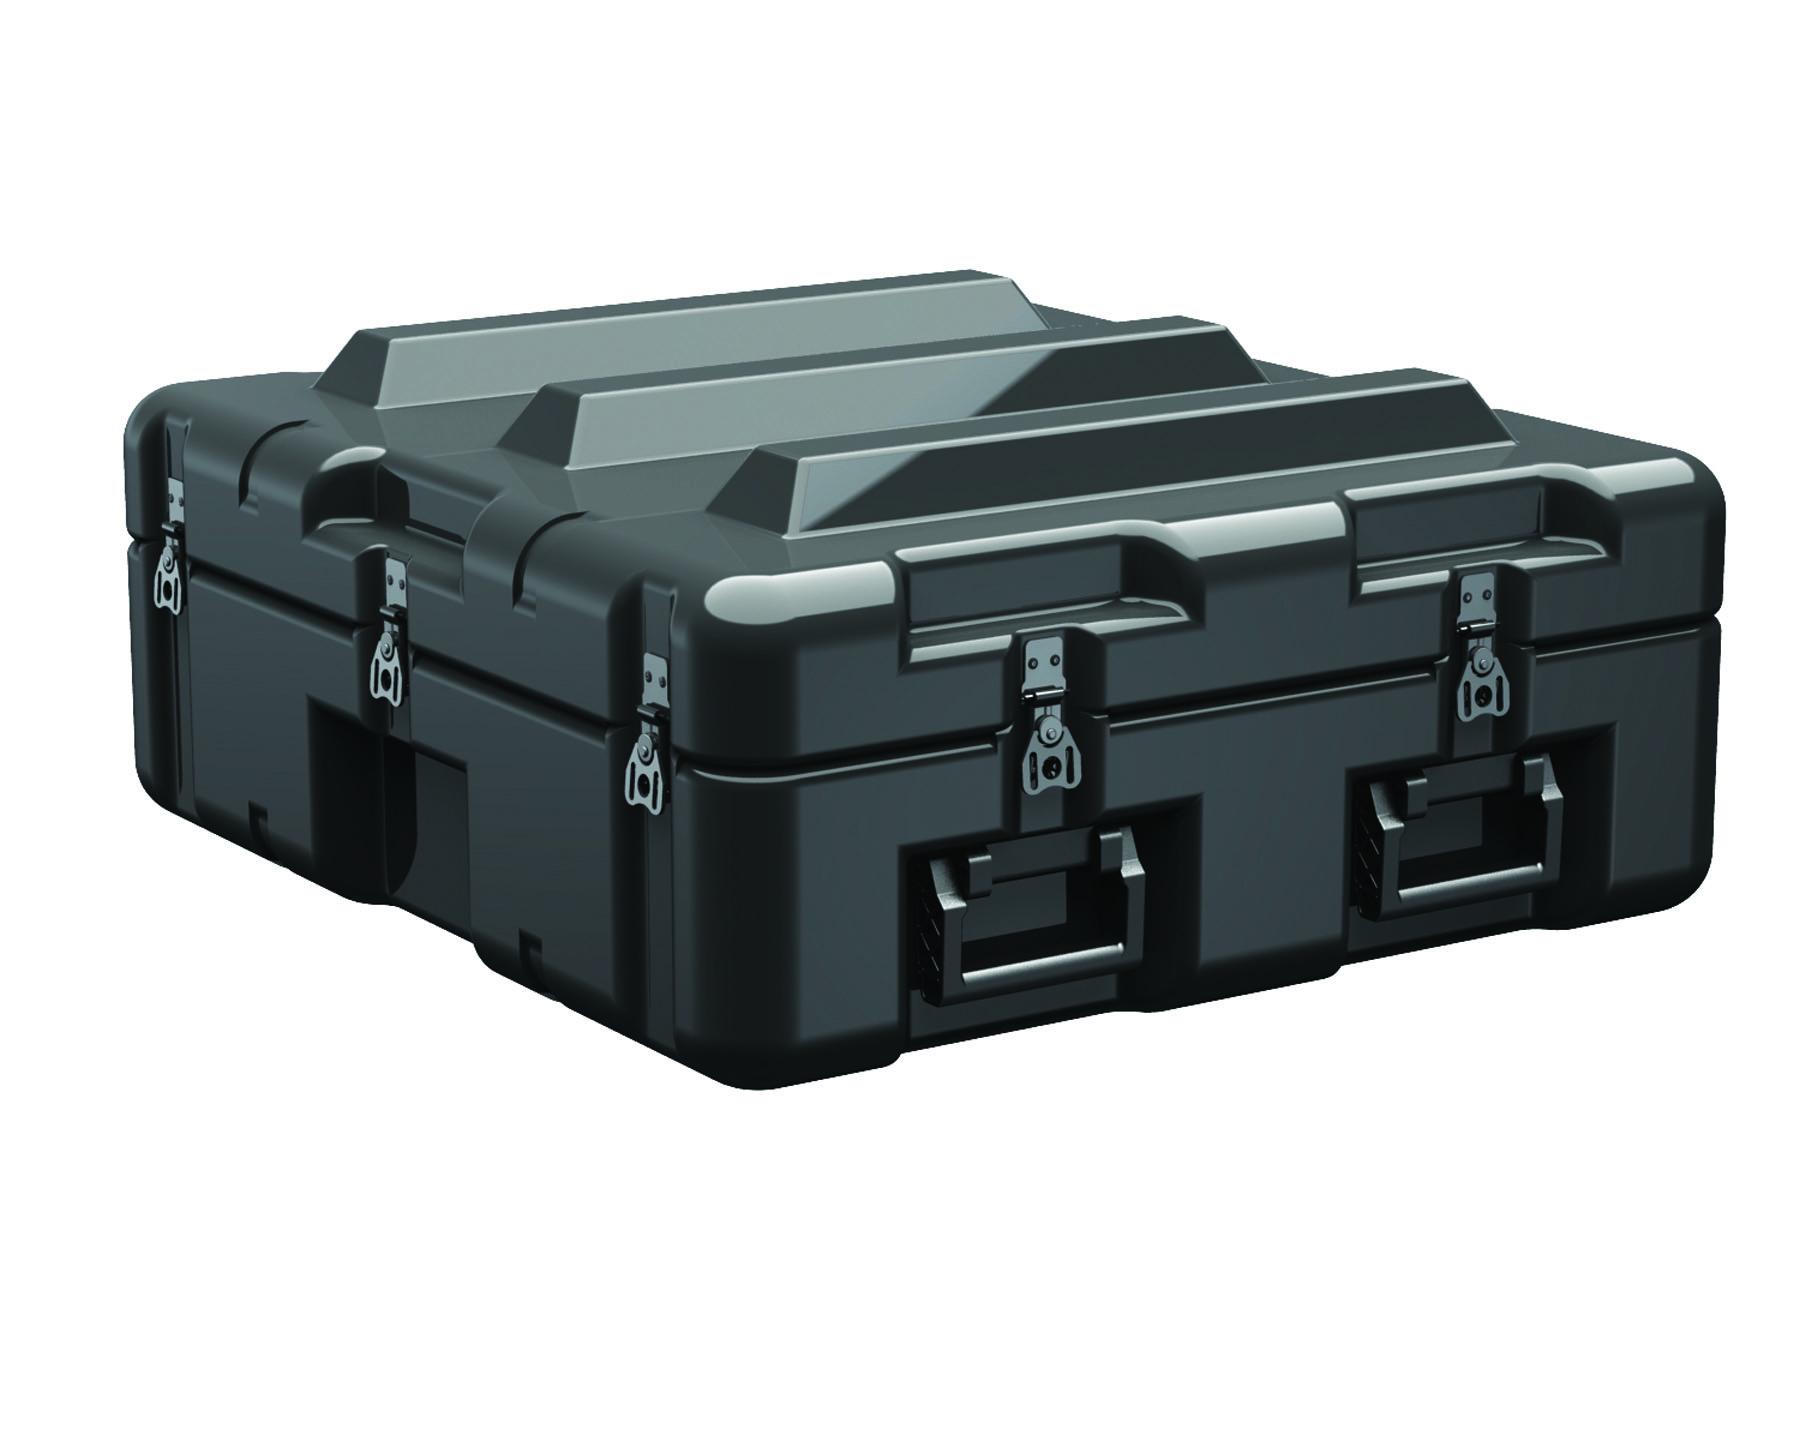 AL2624-0503 - AL2624-0503 Hinged Single Lid Case - CasesTSA